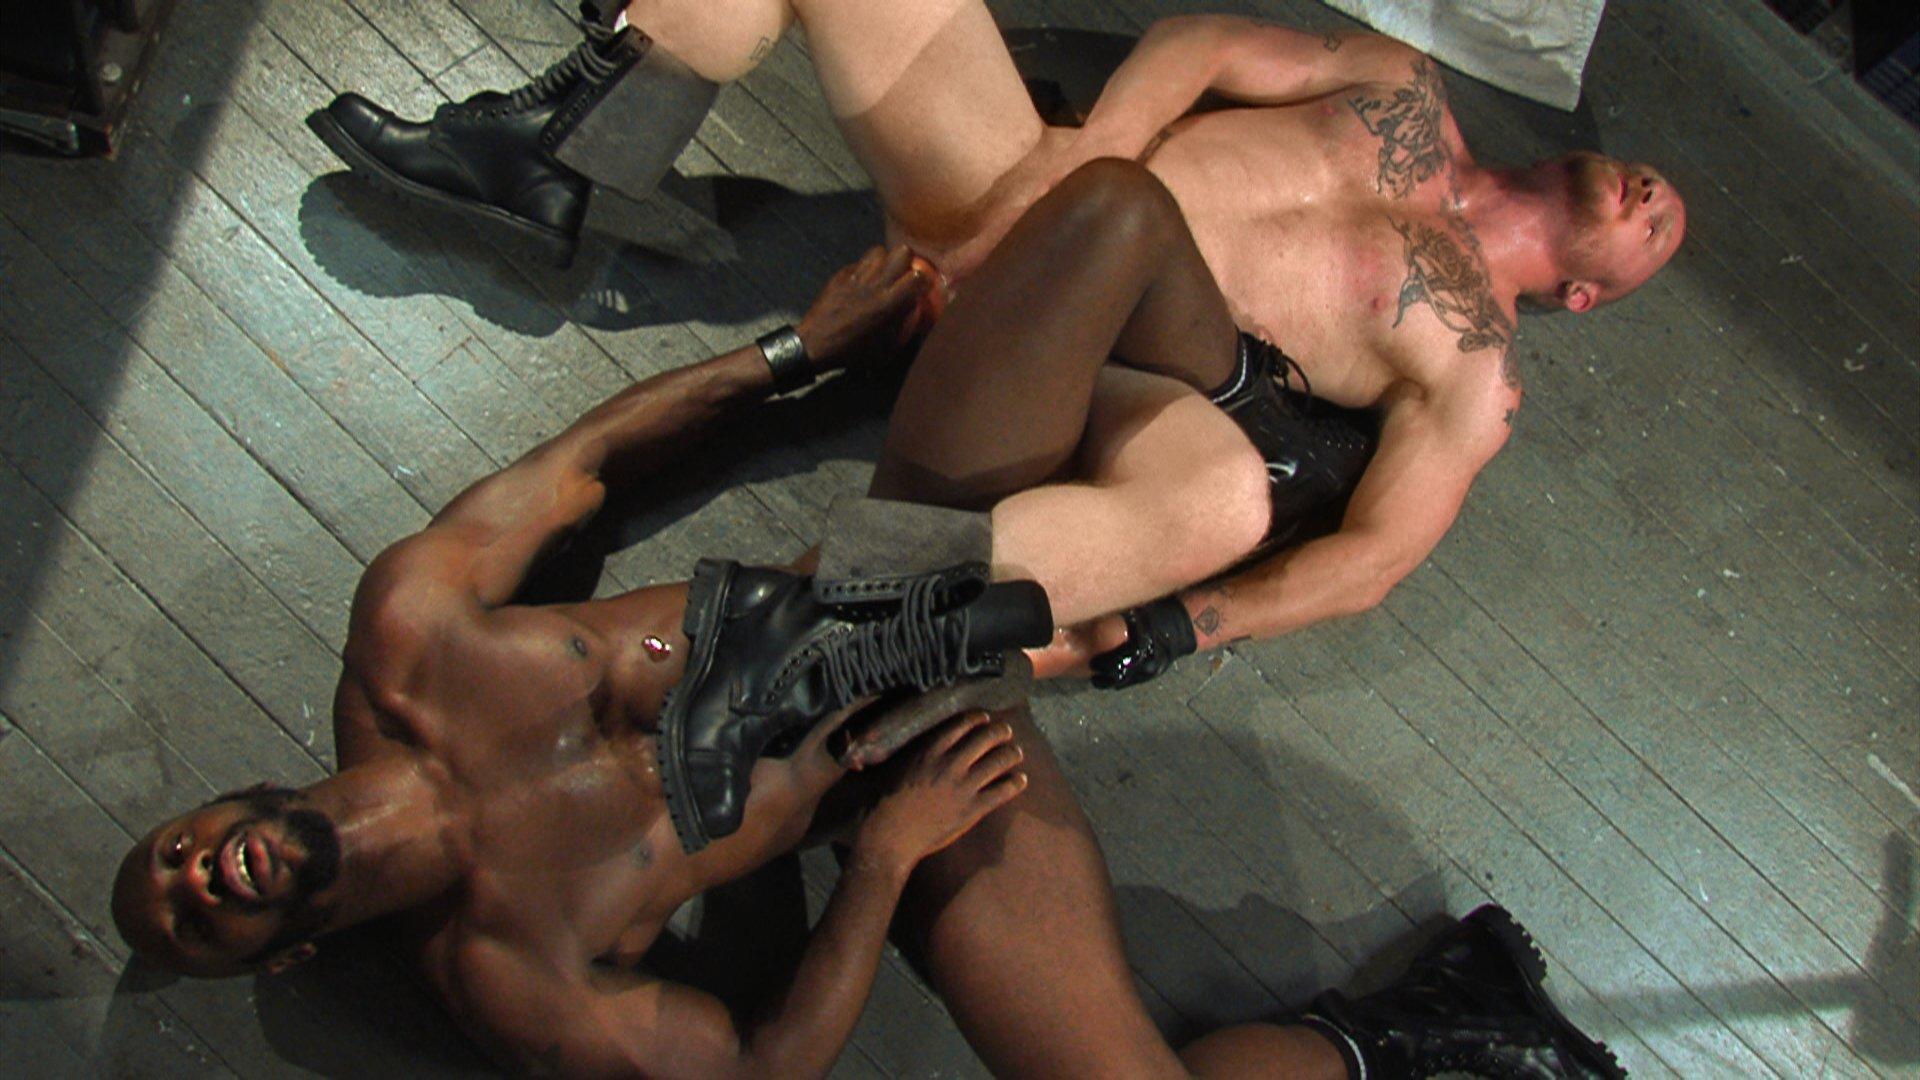 SHOVE IT!: Race Cooper & Brock Rustin